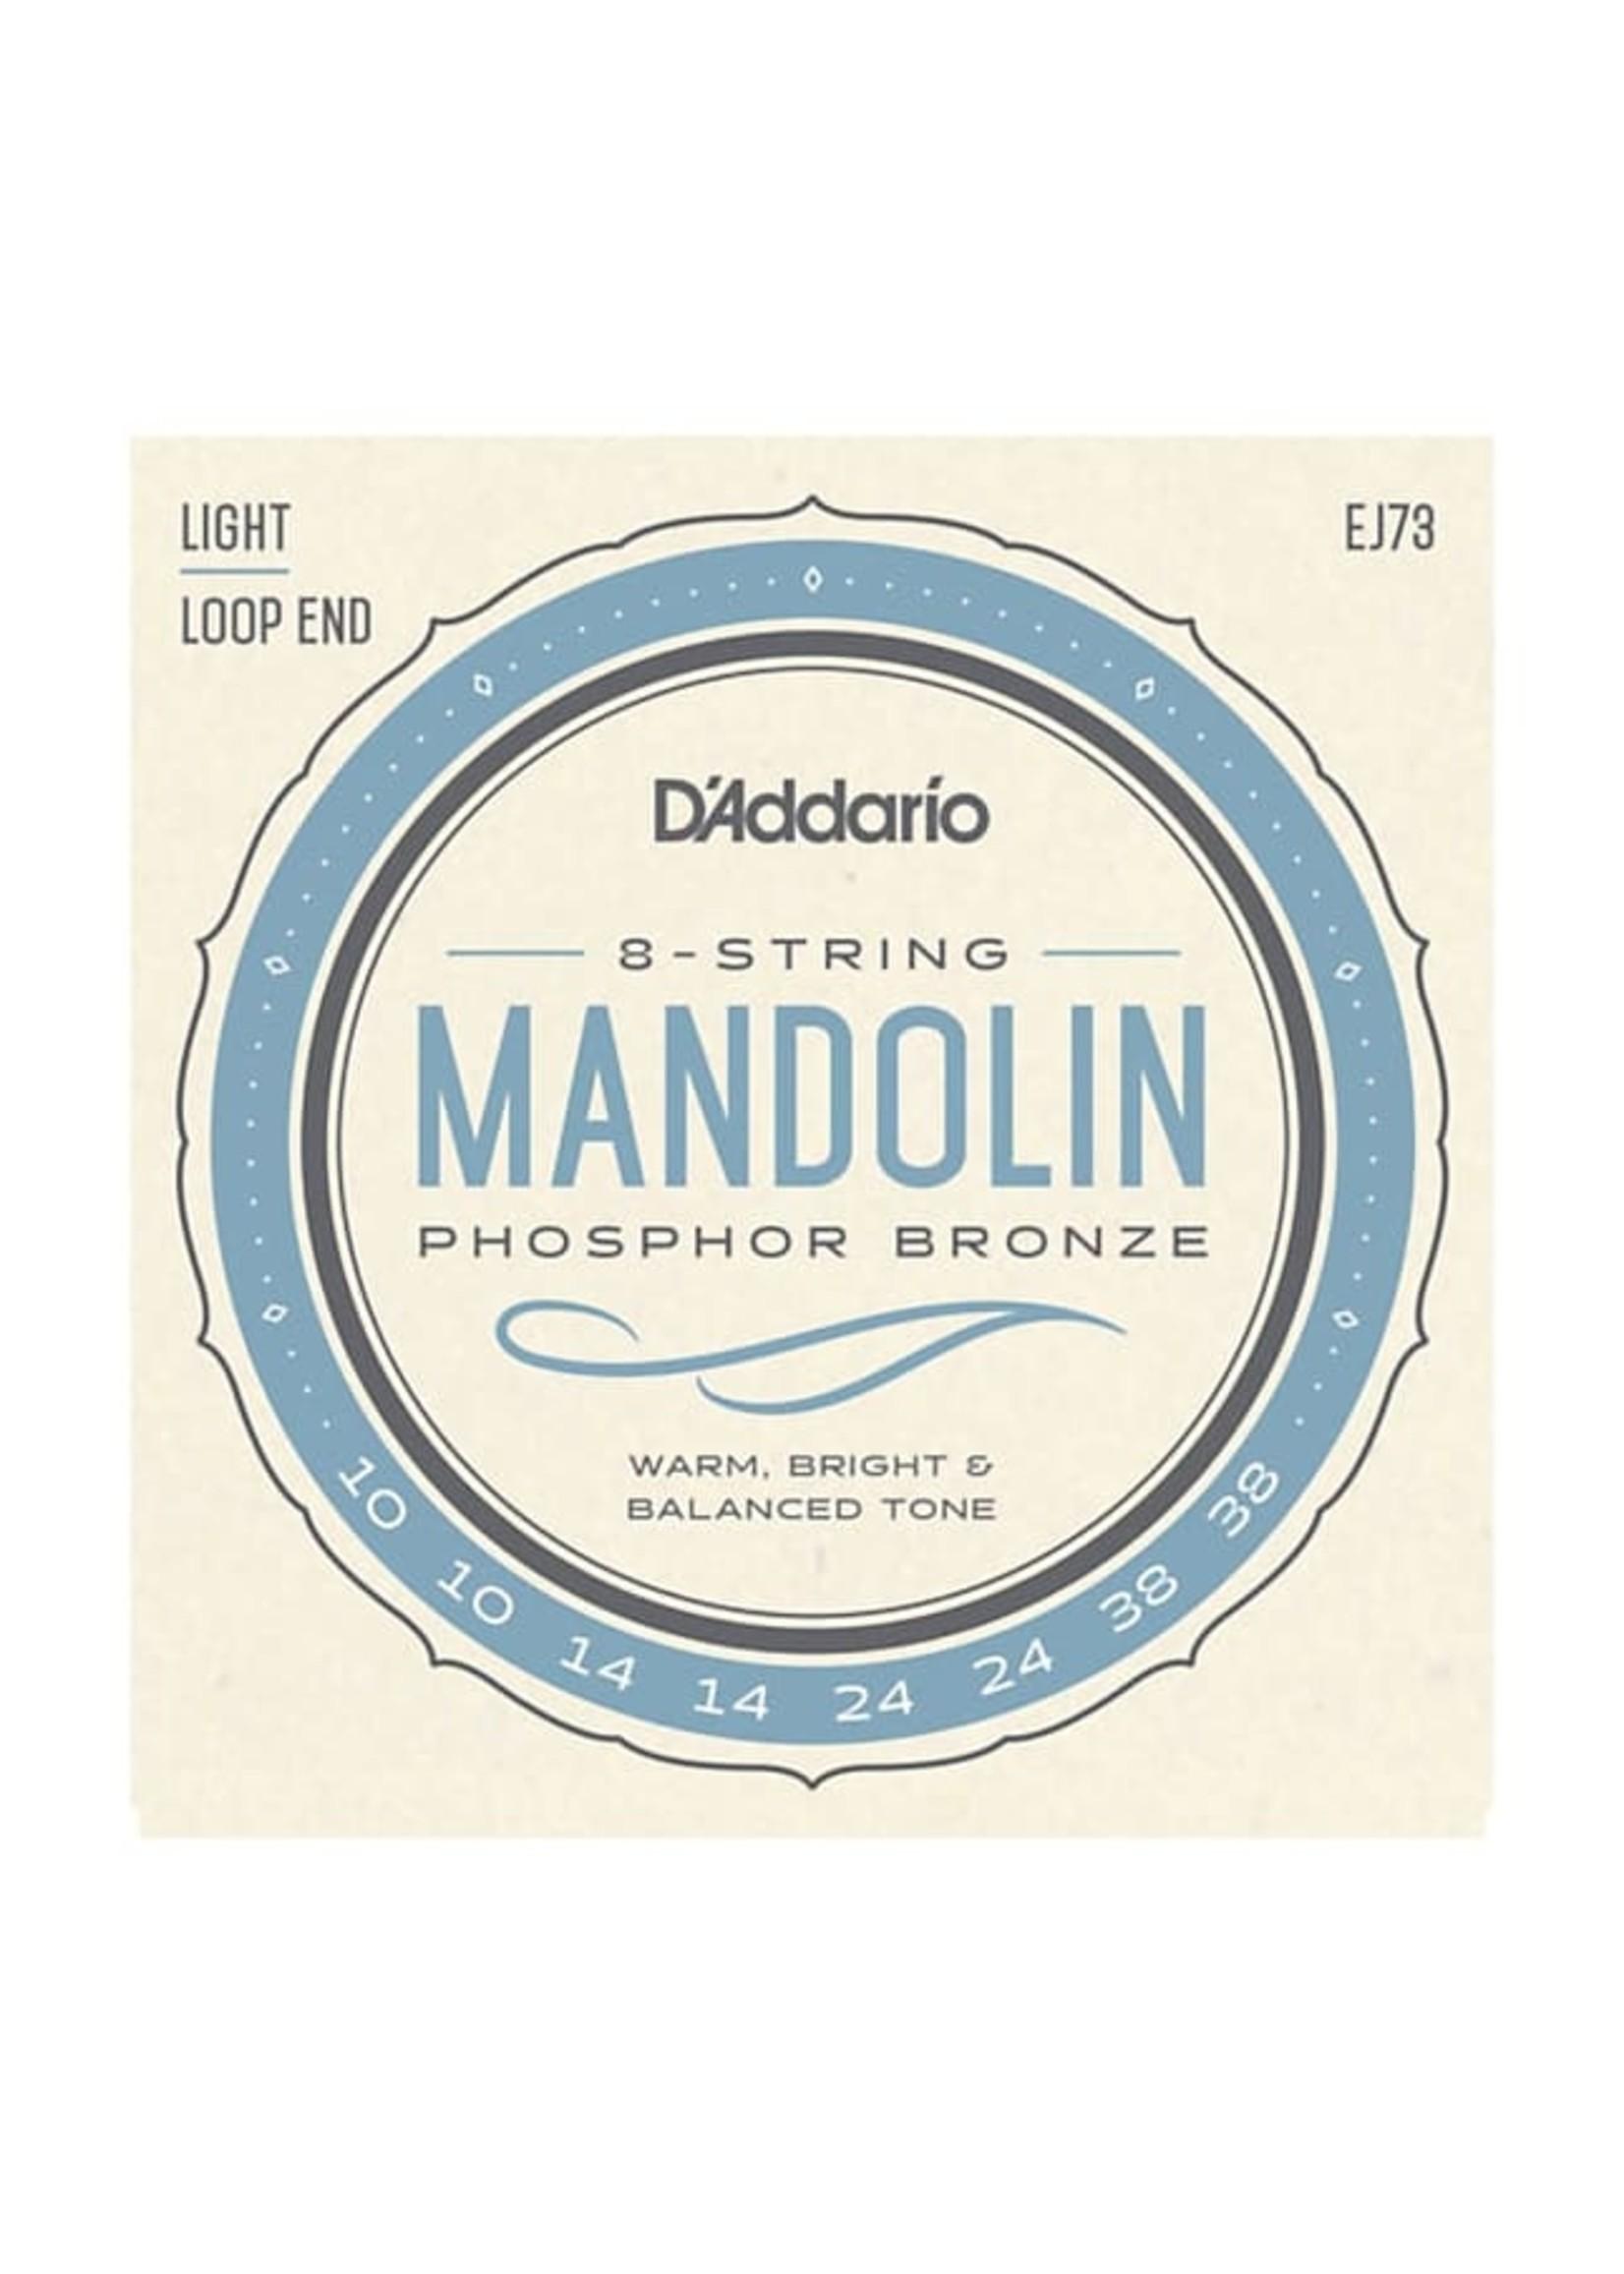 D'Addario D'Addario EJ73 Mandolin, Phosphor Bronze, Light, 10-38